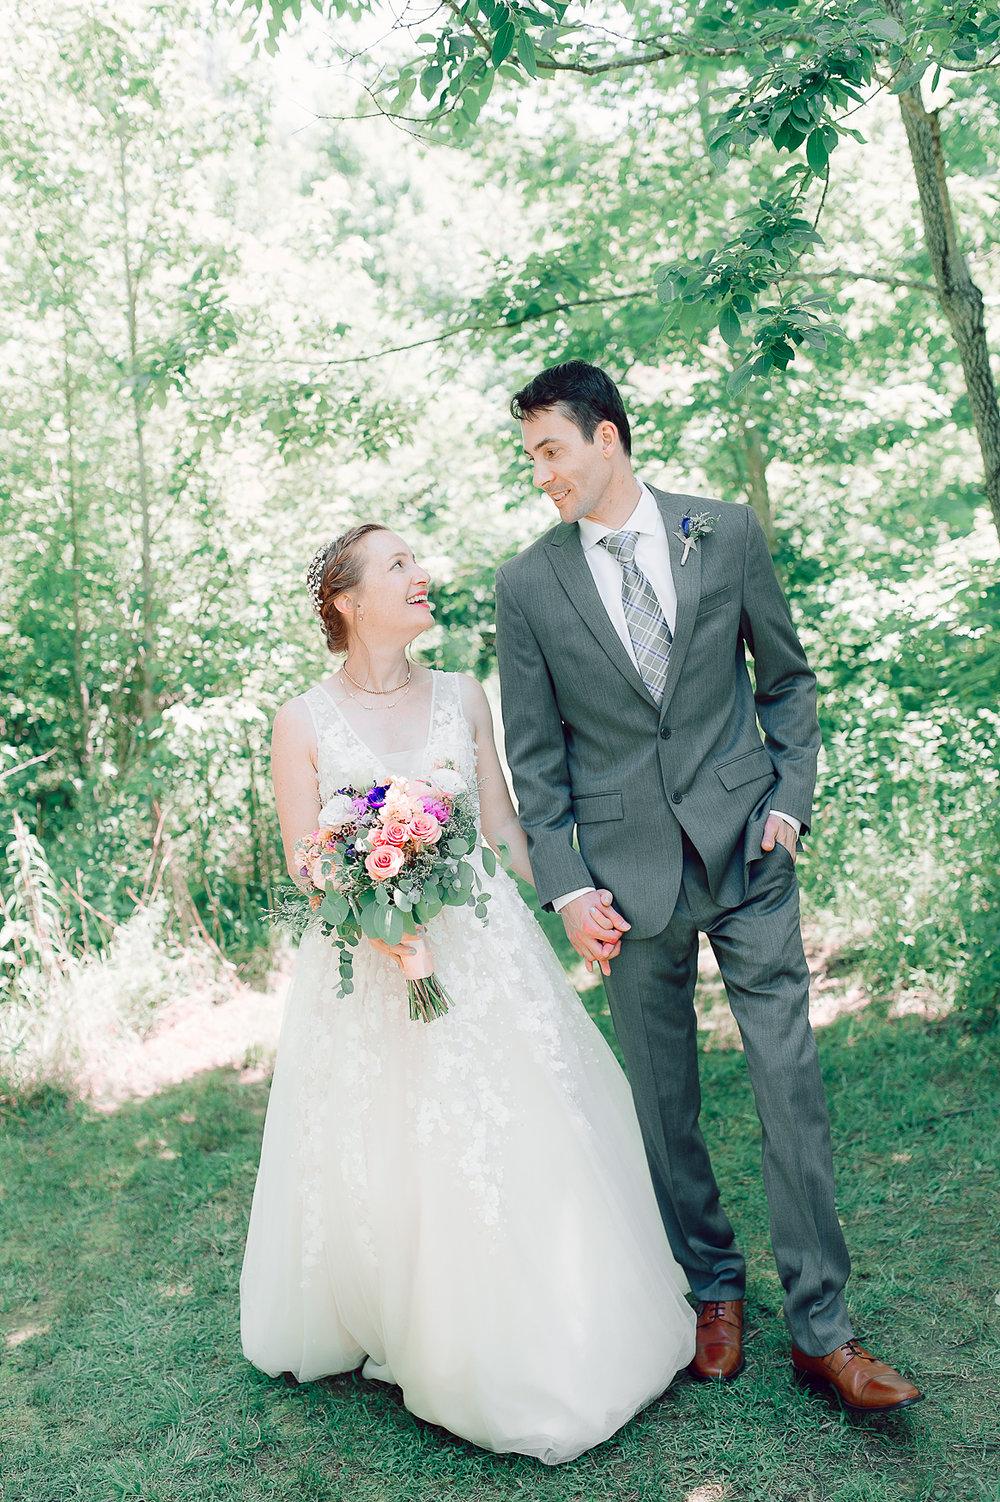 virginiawedding_theGlasgowFarm_rusticwedding_fredericksburg_youseephotography_CarolineDale (52).jpg